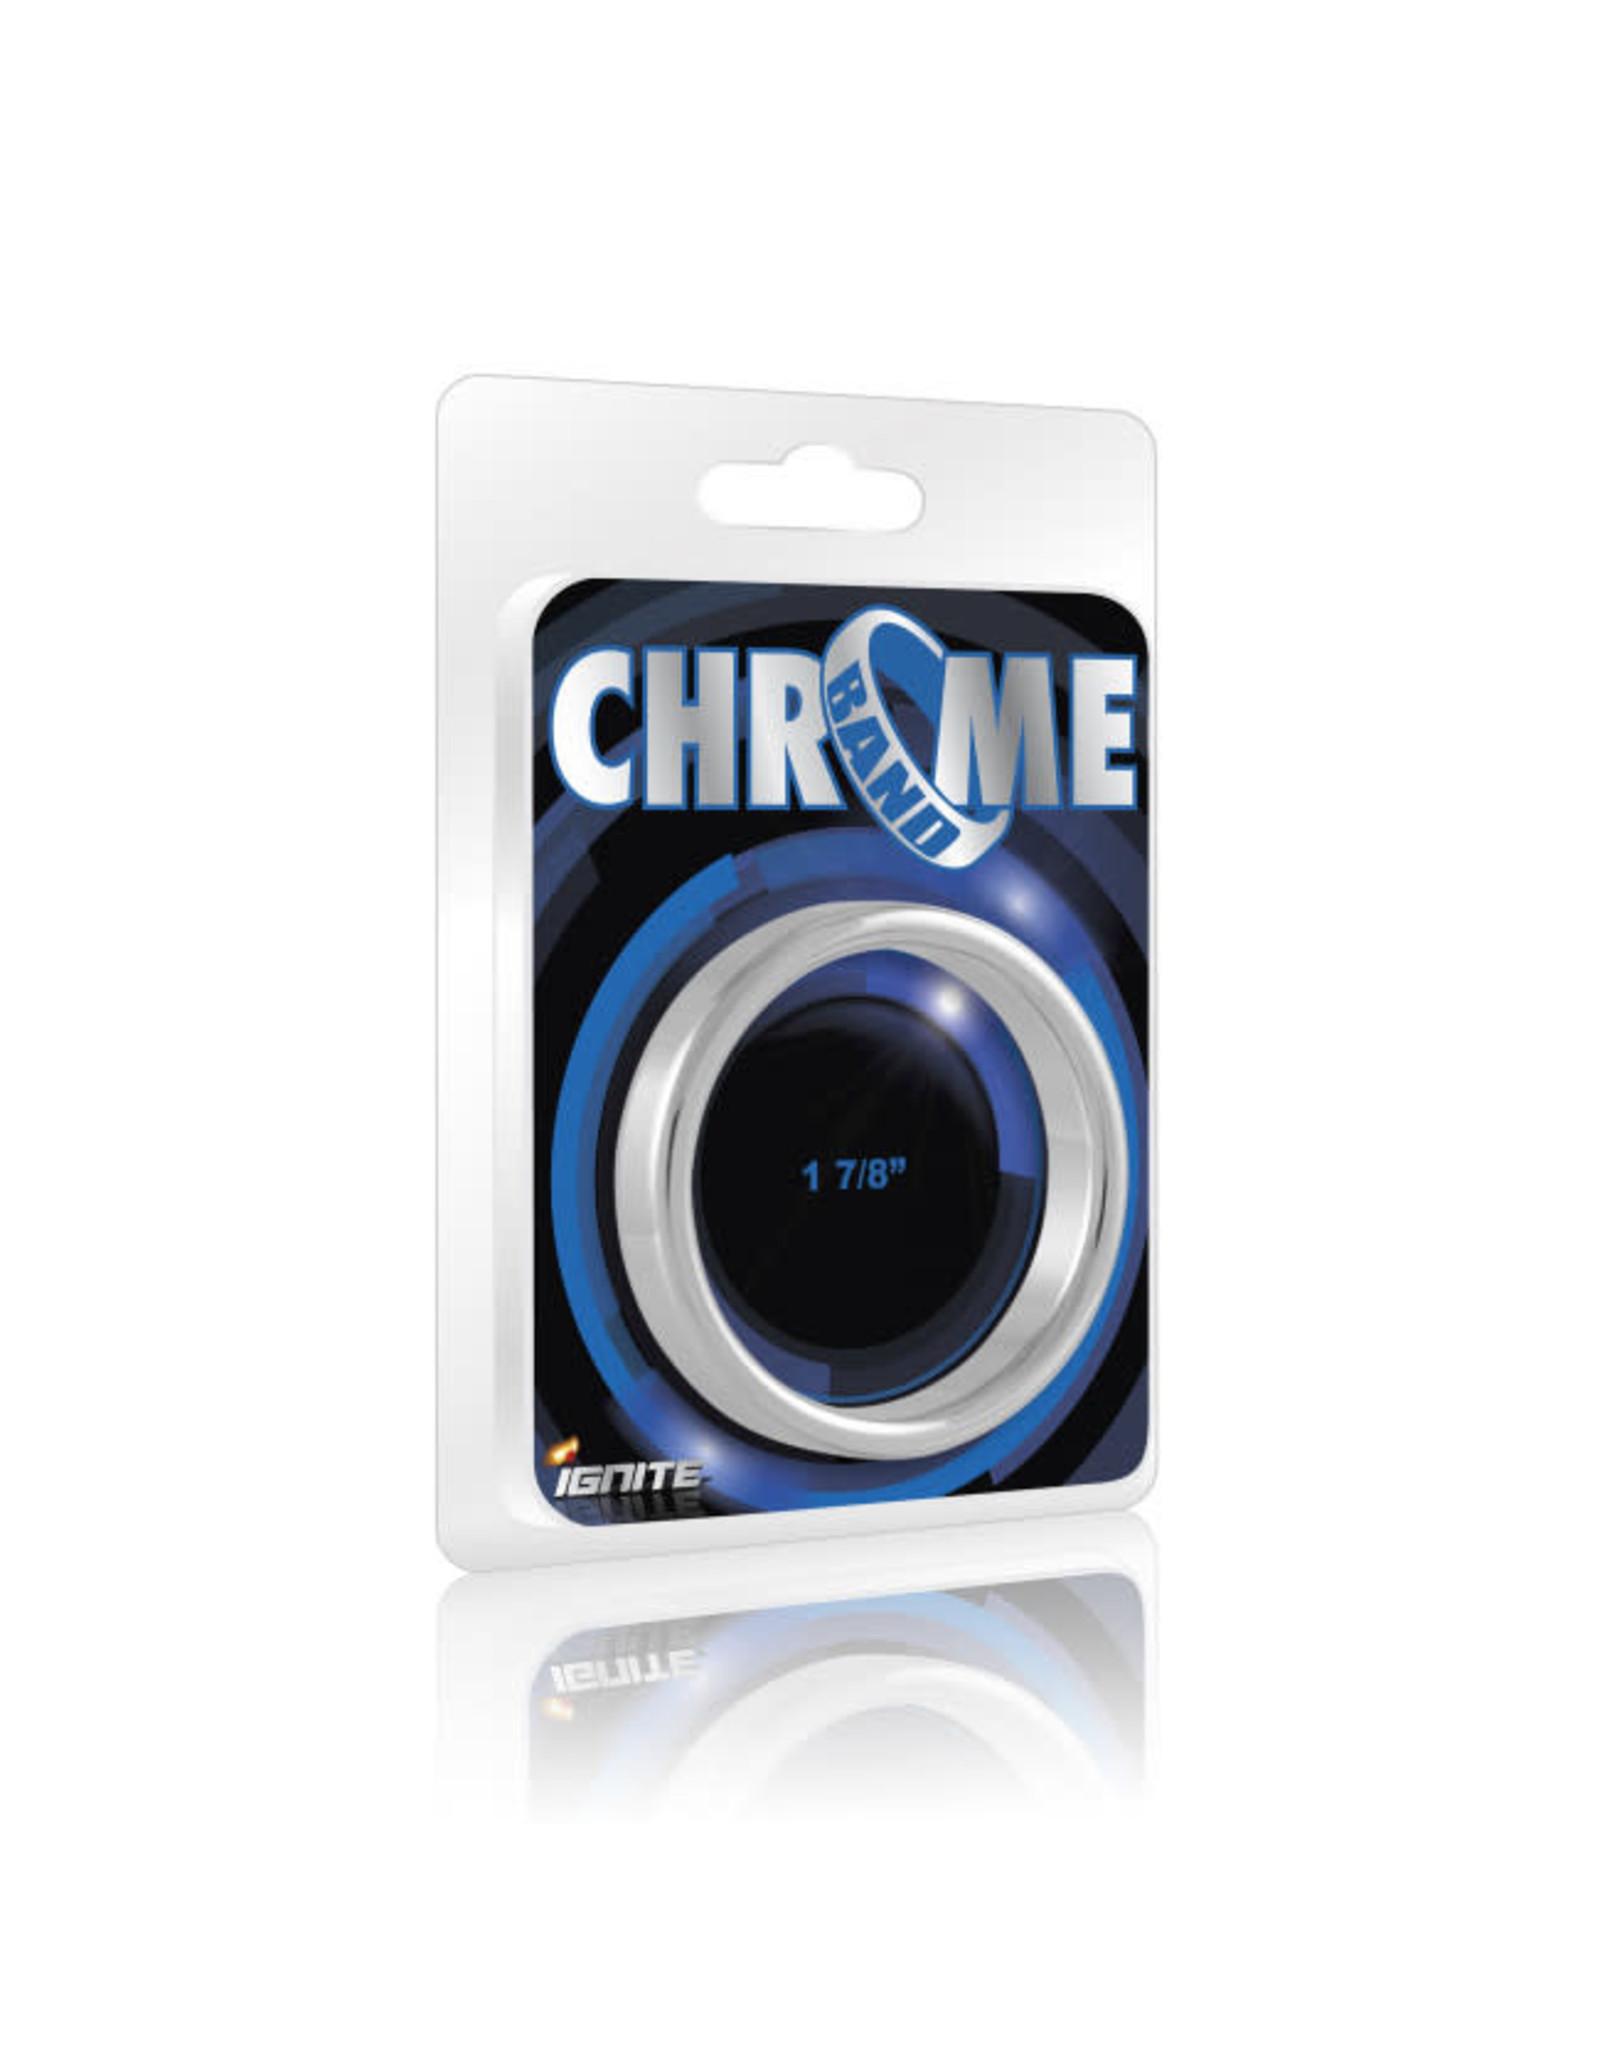 Ignite Ignite Chrome Band Cockring